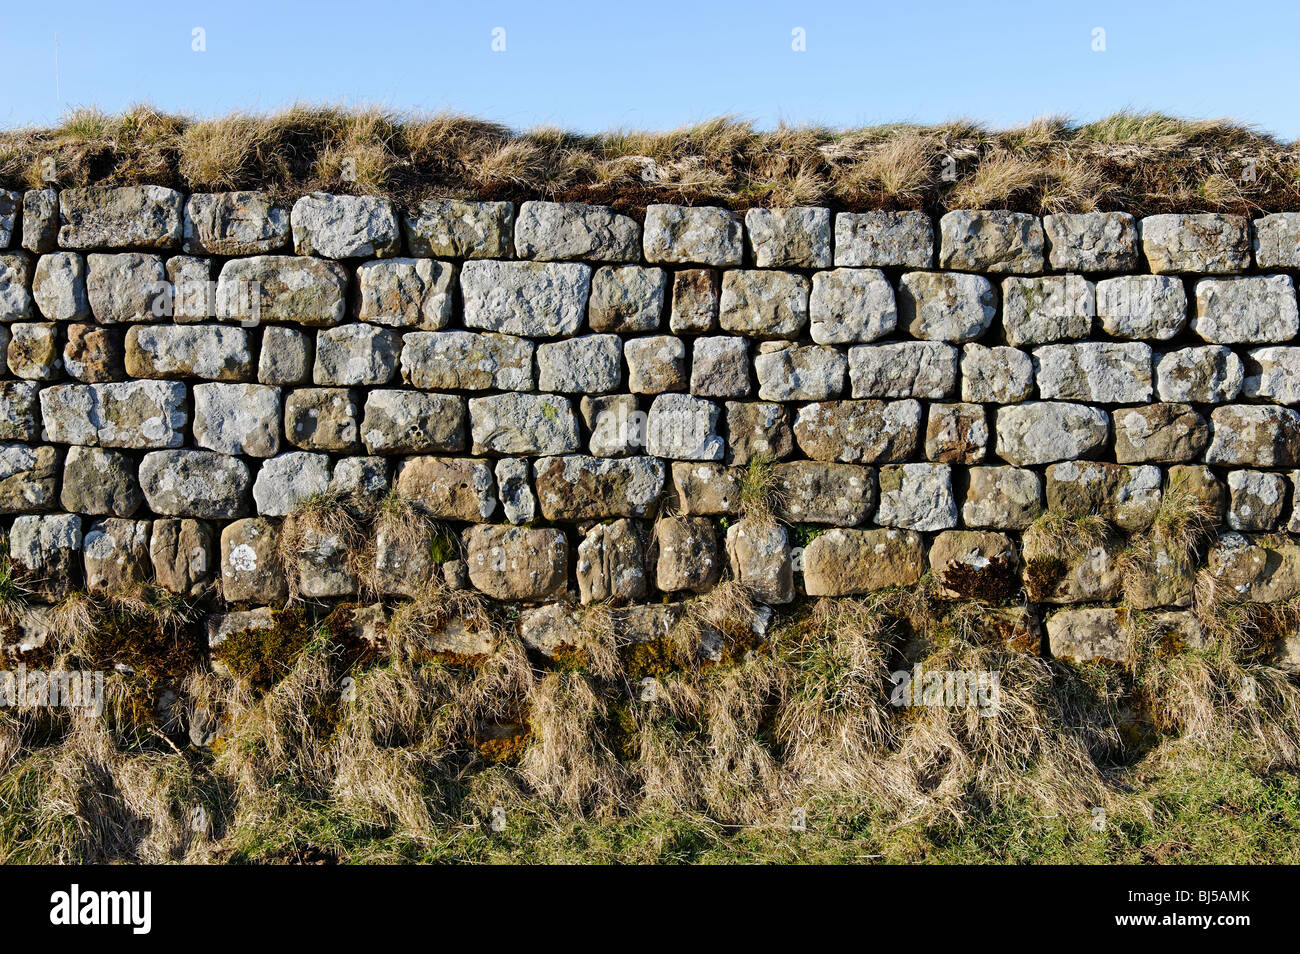 Detail of stonework on Hadrian's Wall - Stock Image